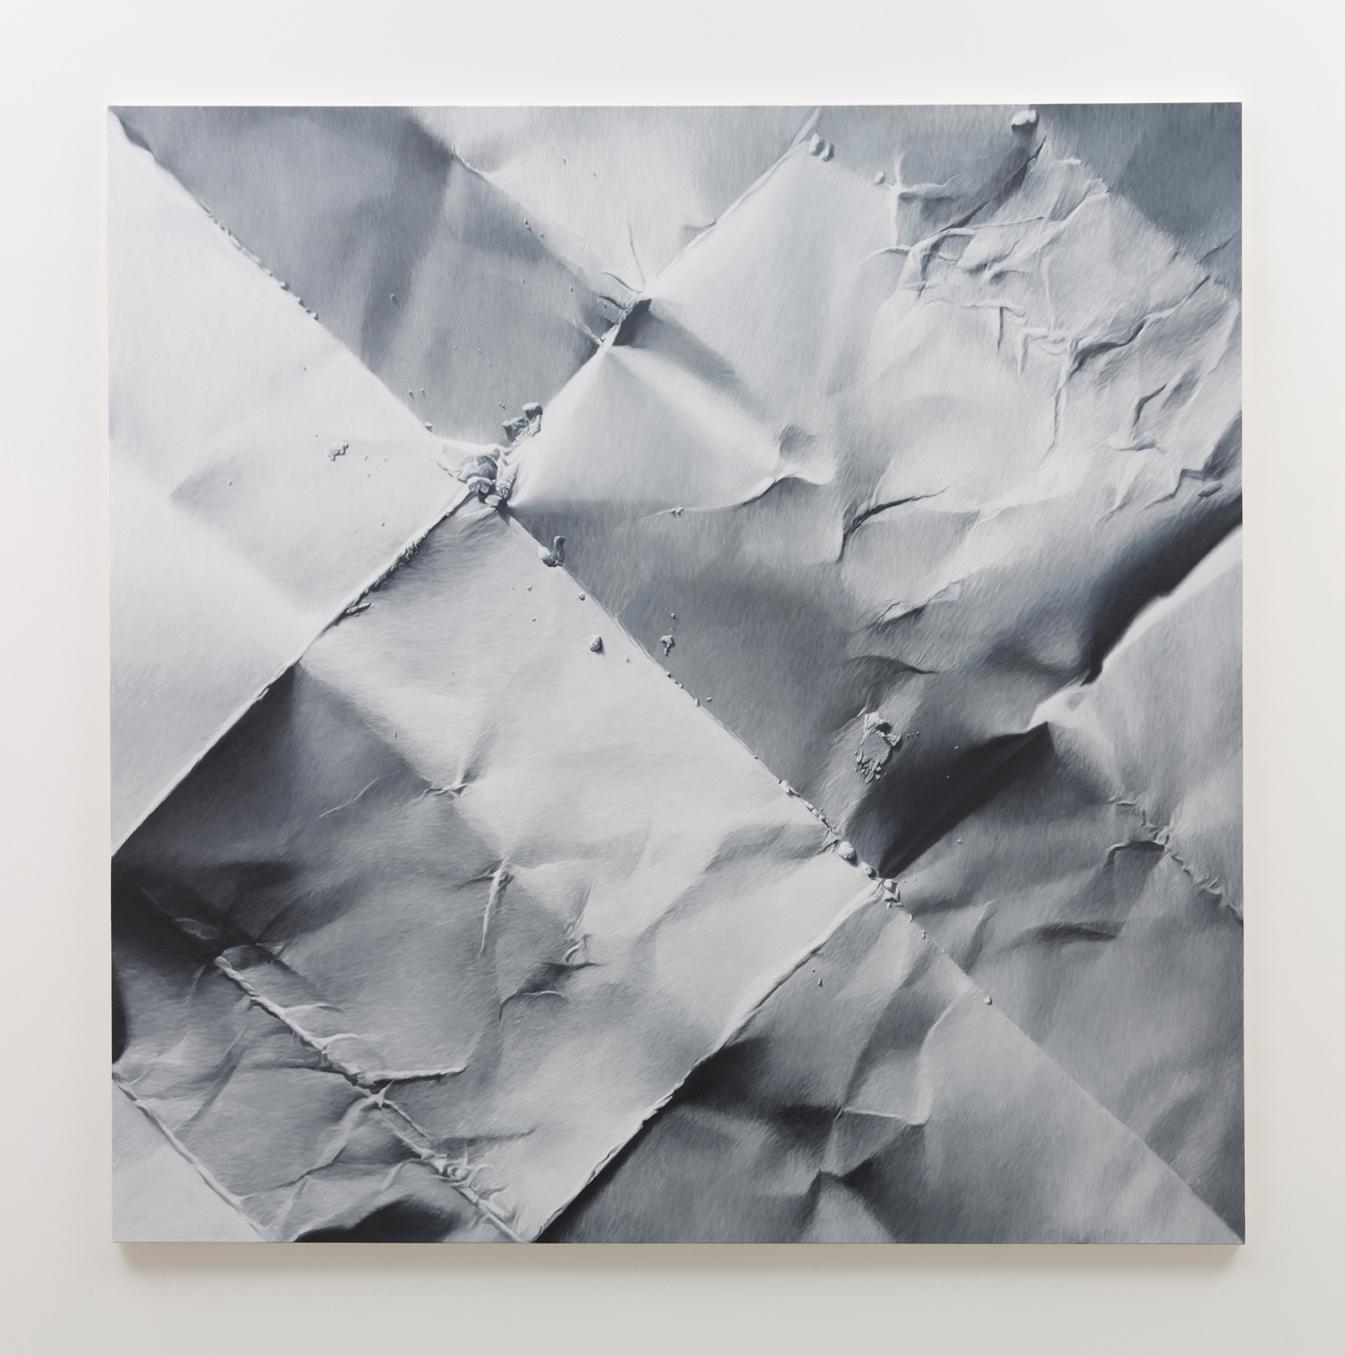 Palomino, 2012 Oil on canvas 230cm x 230cm